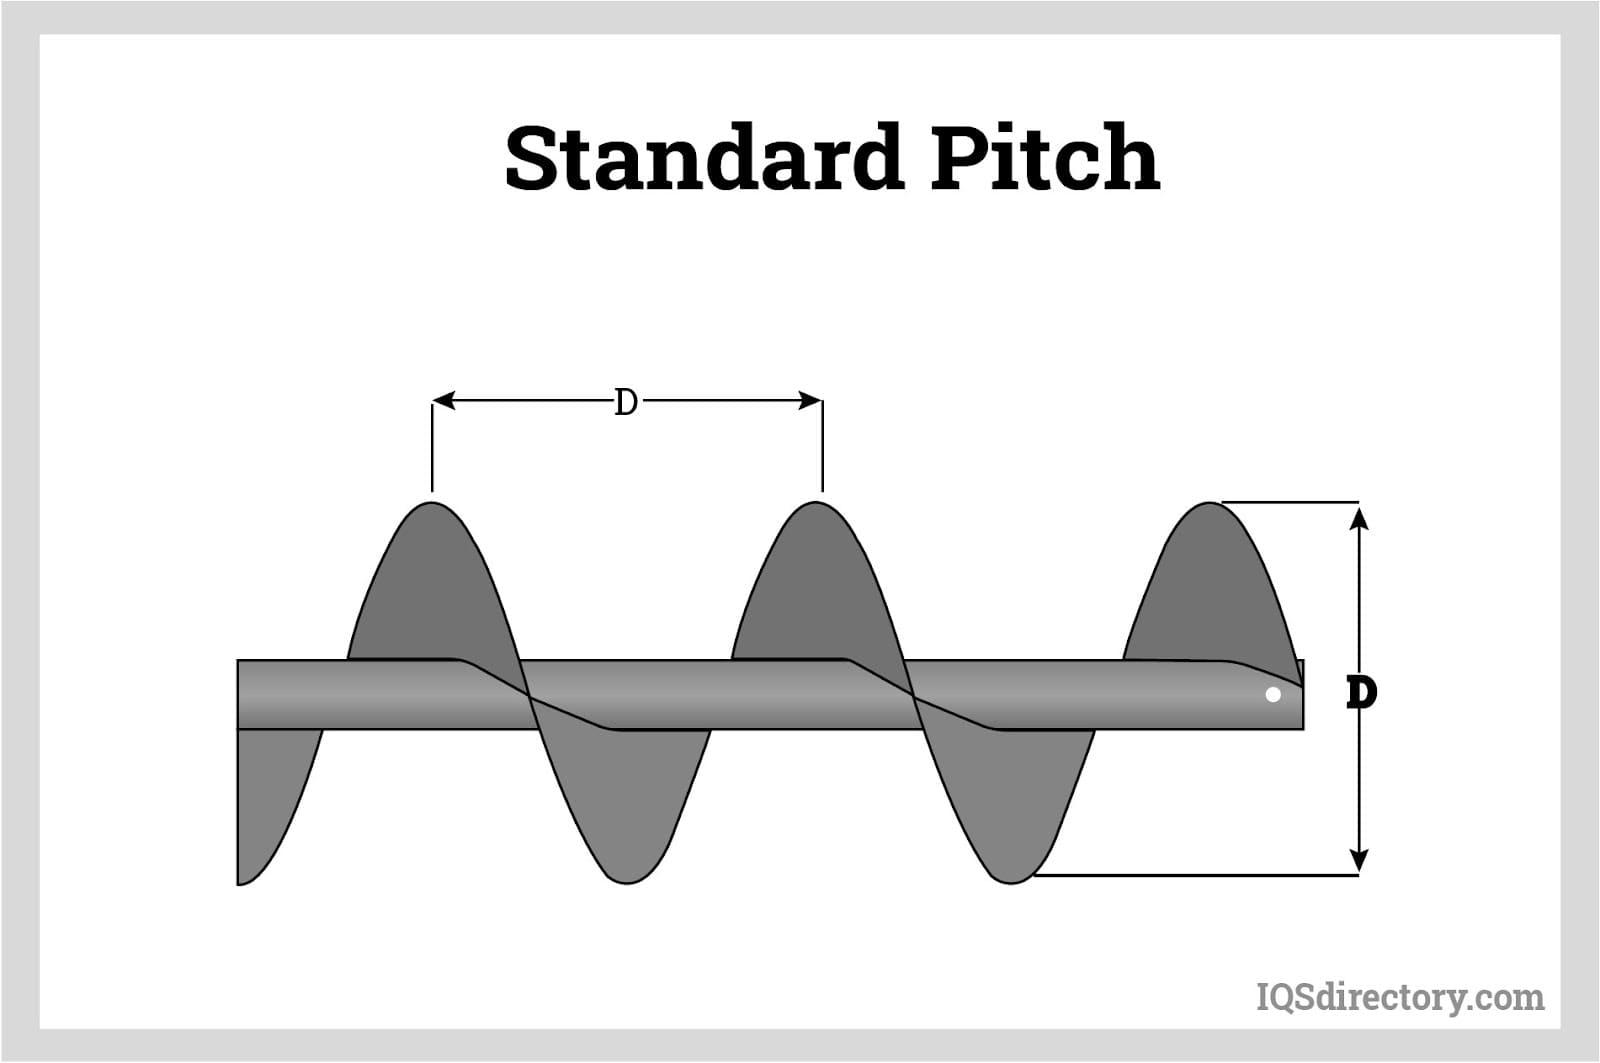 Standard Pitch